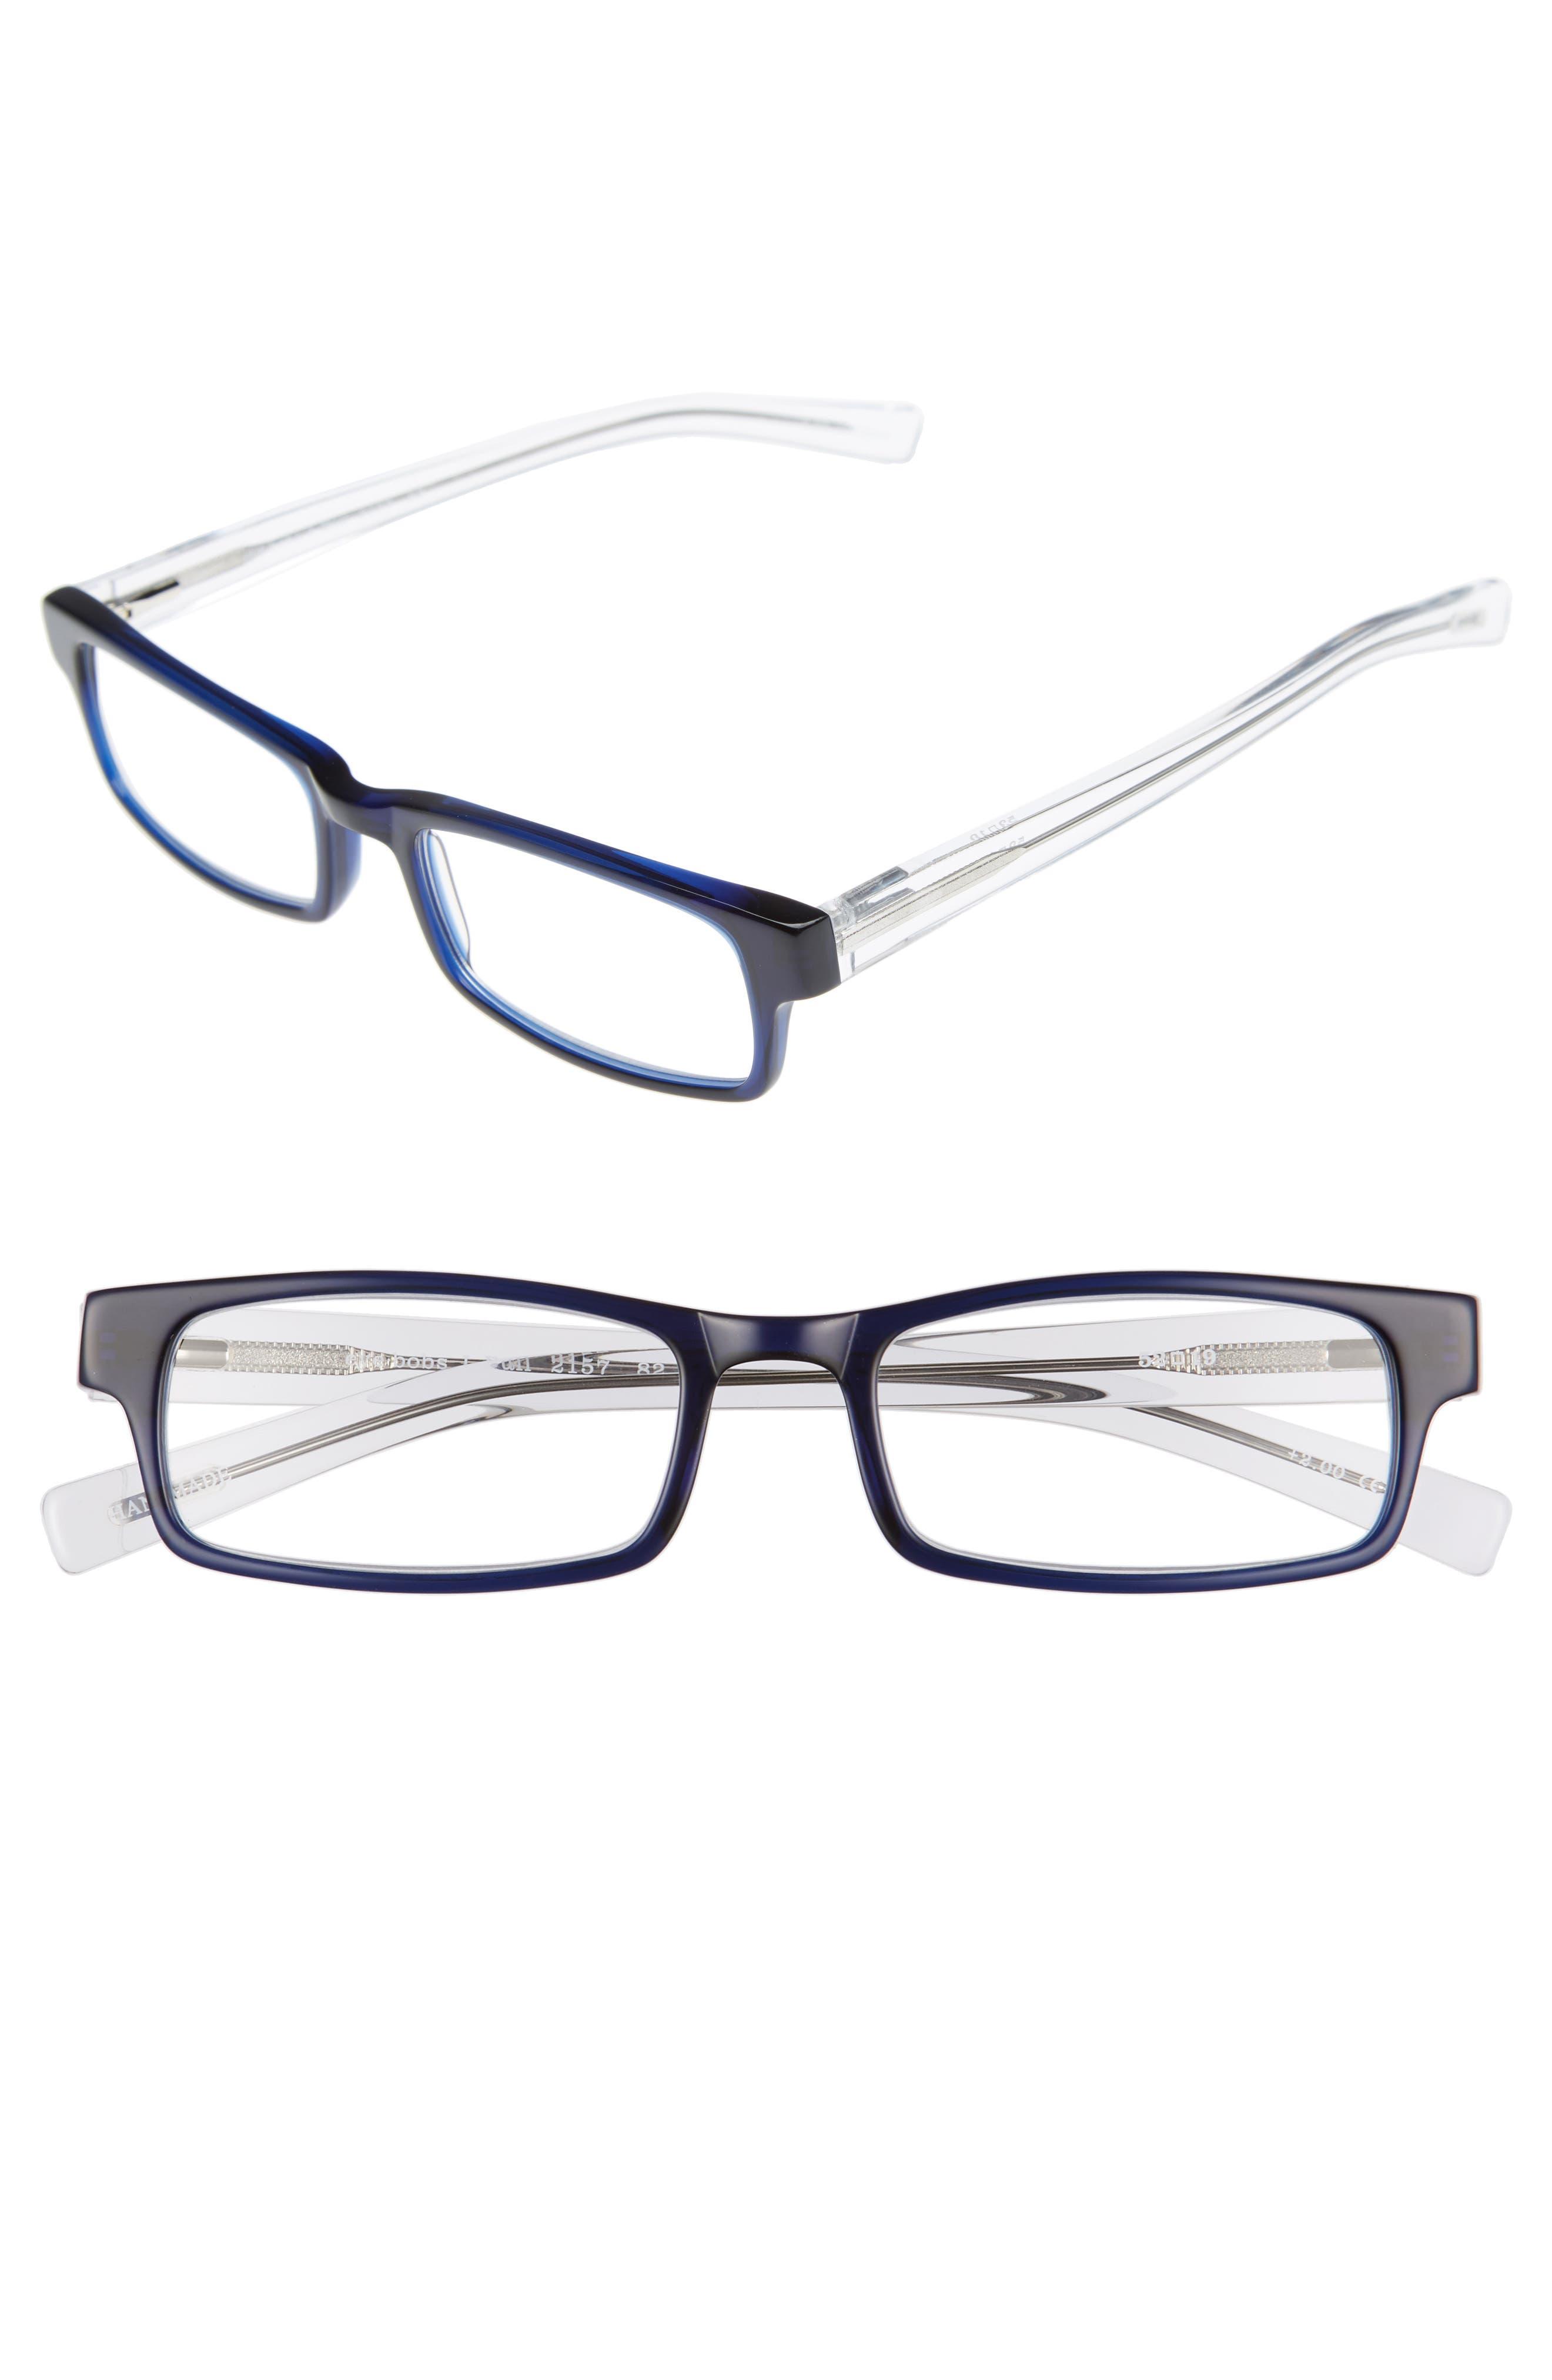 I Ball 52mm Reading Glasses,                         Main,                         color,